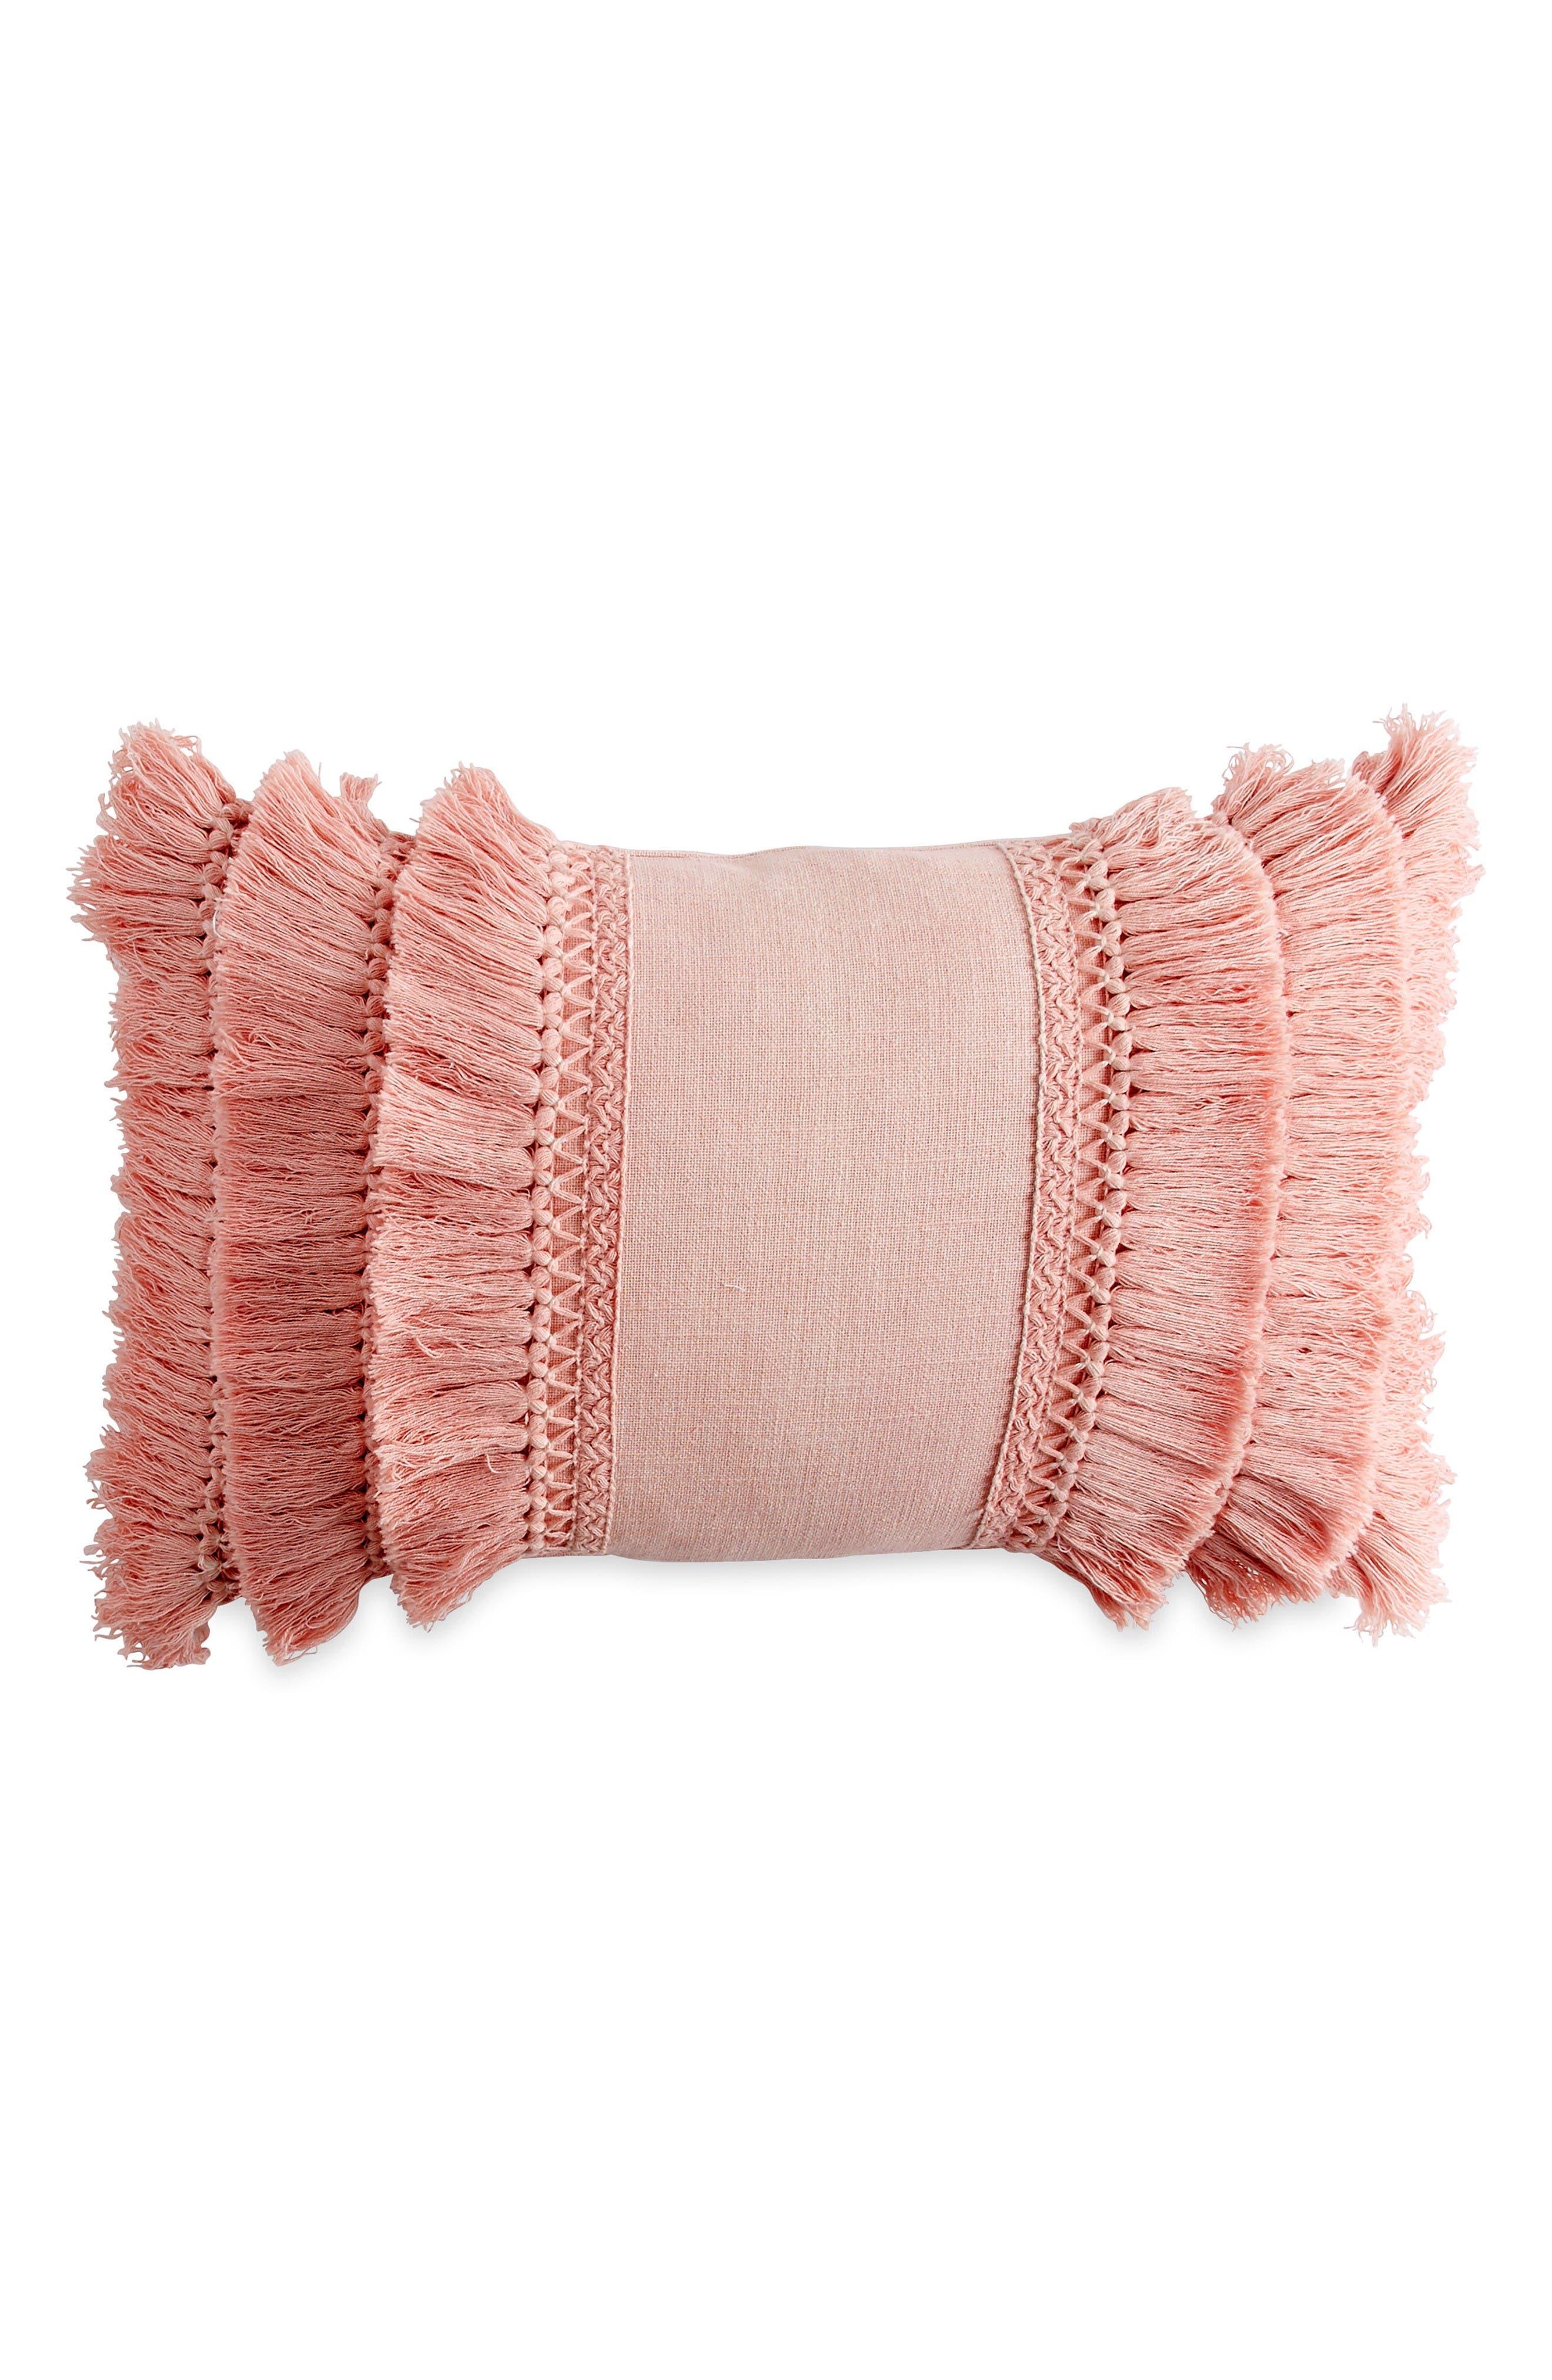 Fringe Pillow,                         Main,                         color, Blush